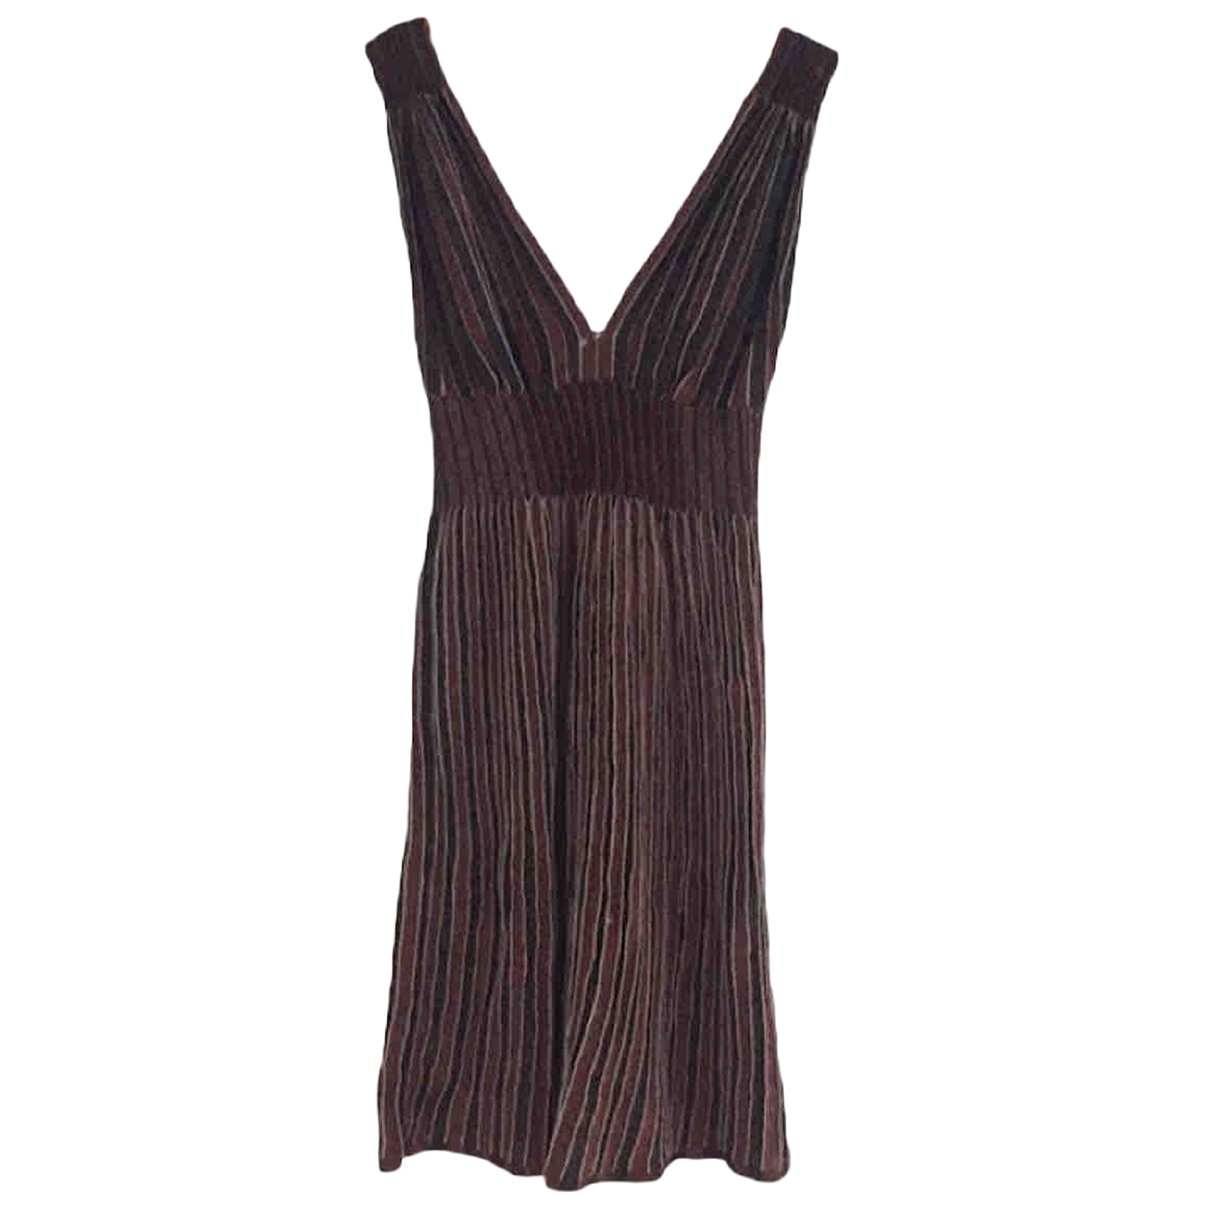 M Missoni \N Metallic dress for Women 42 IT